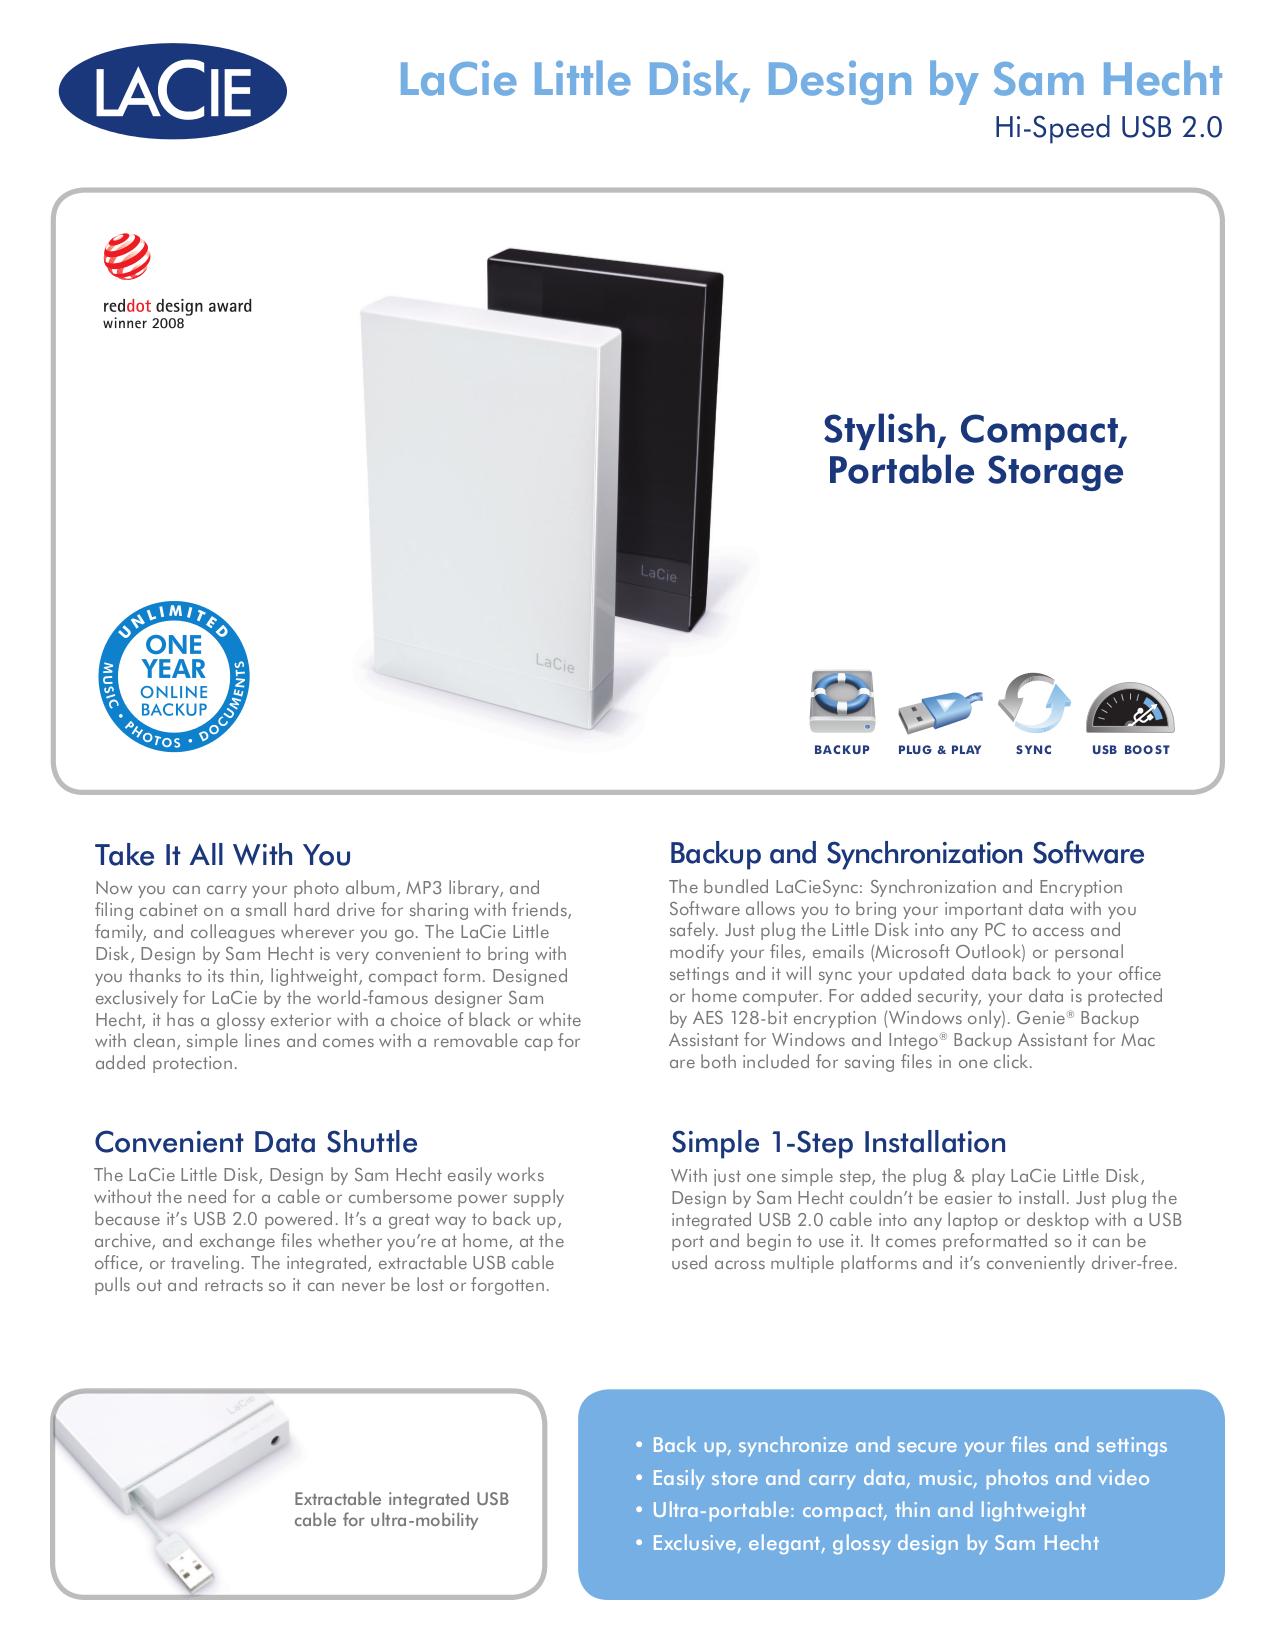 pdf for LaCie Storage 301278 manual